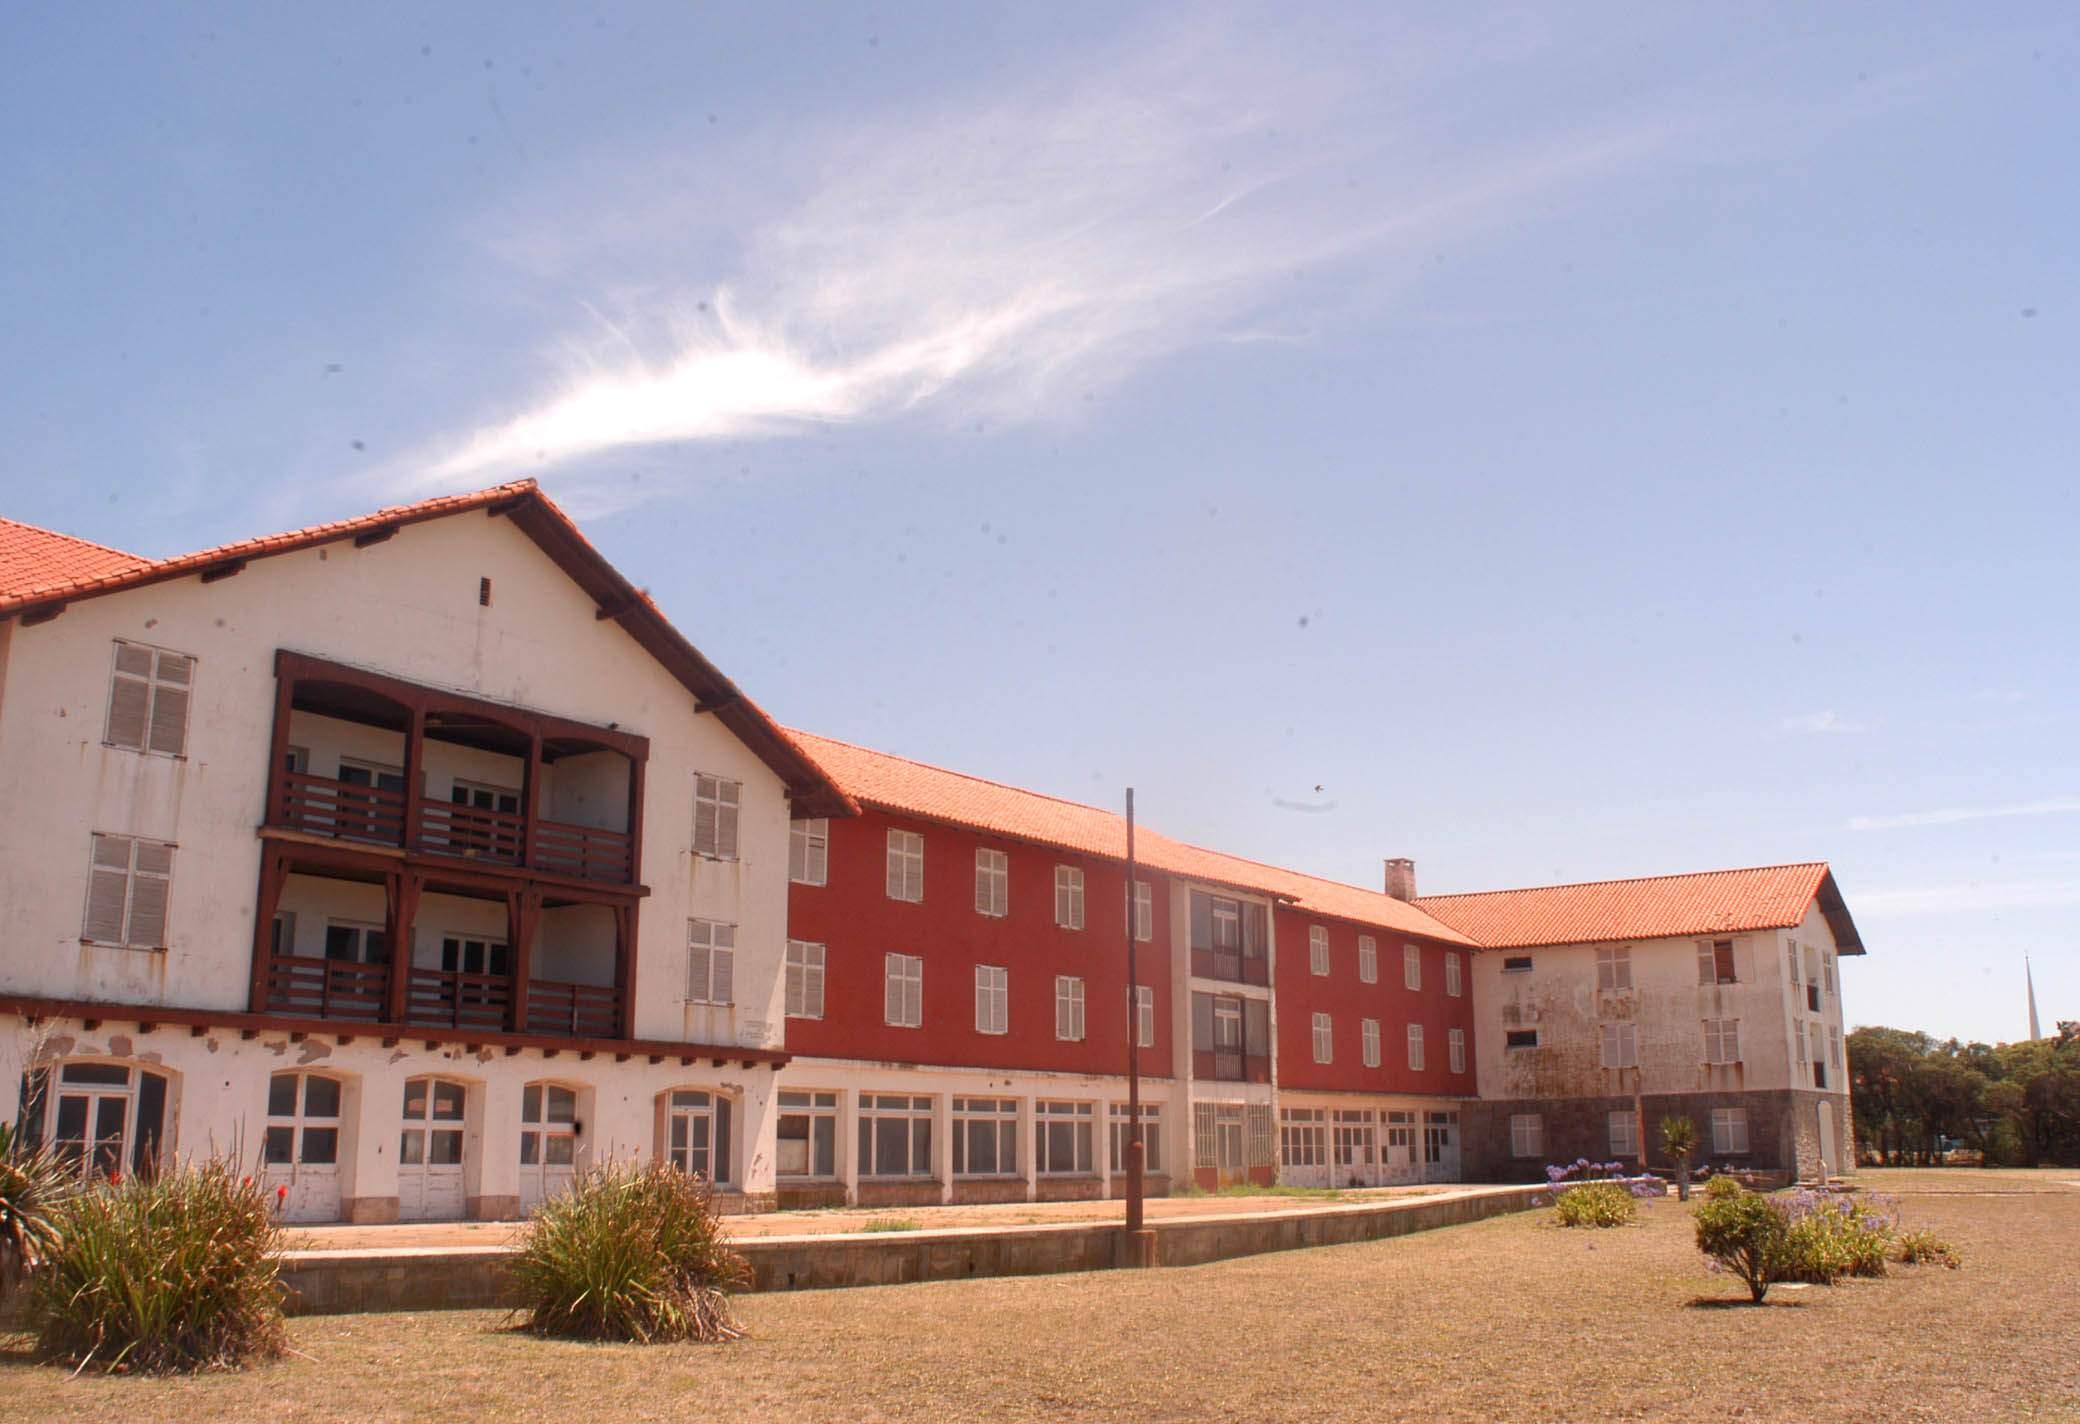 Chapadmalal hotel